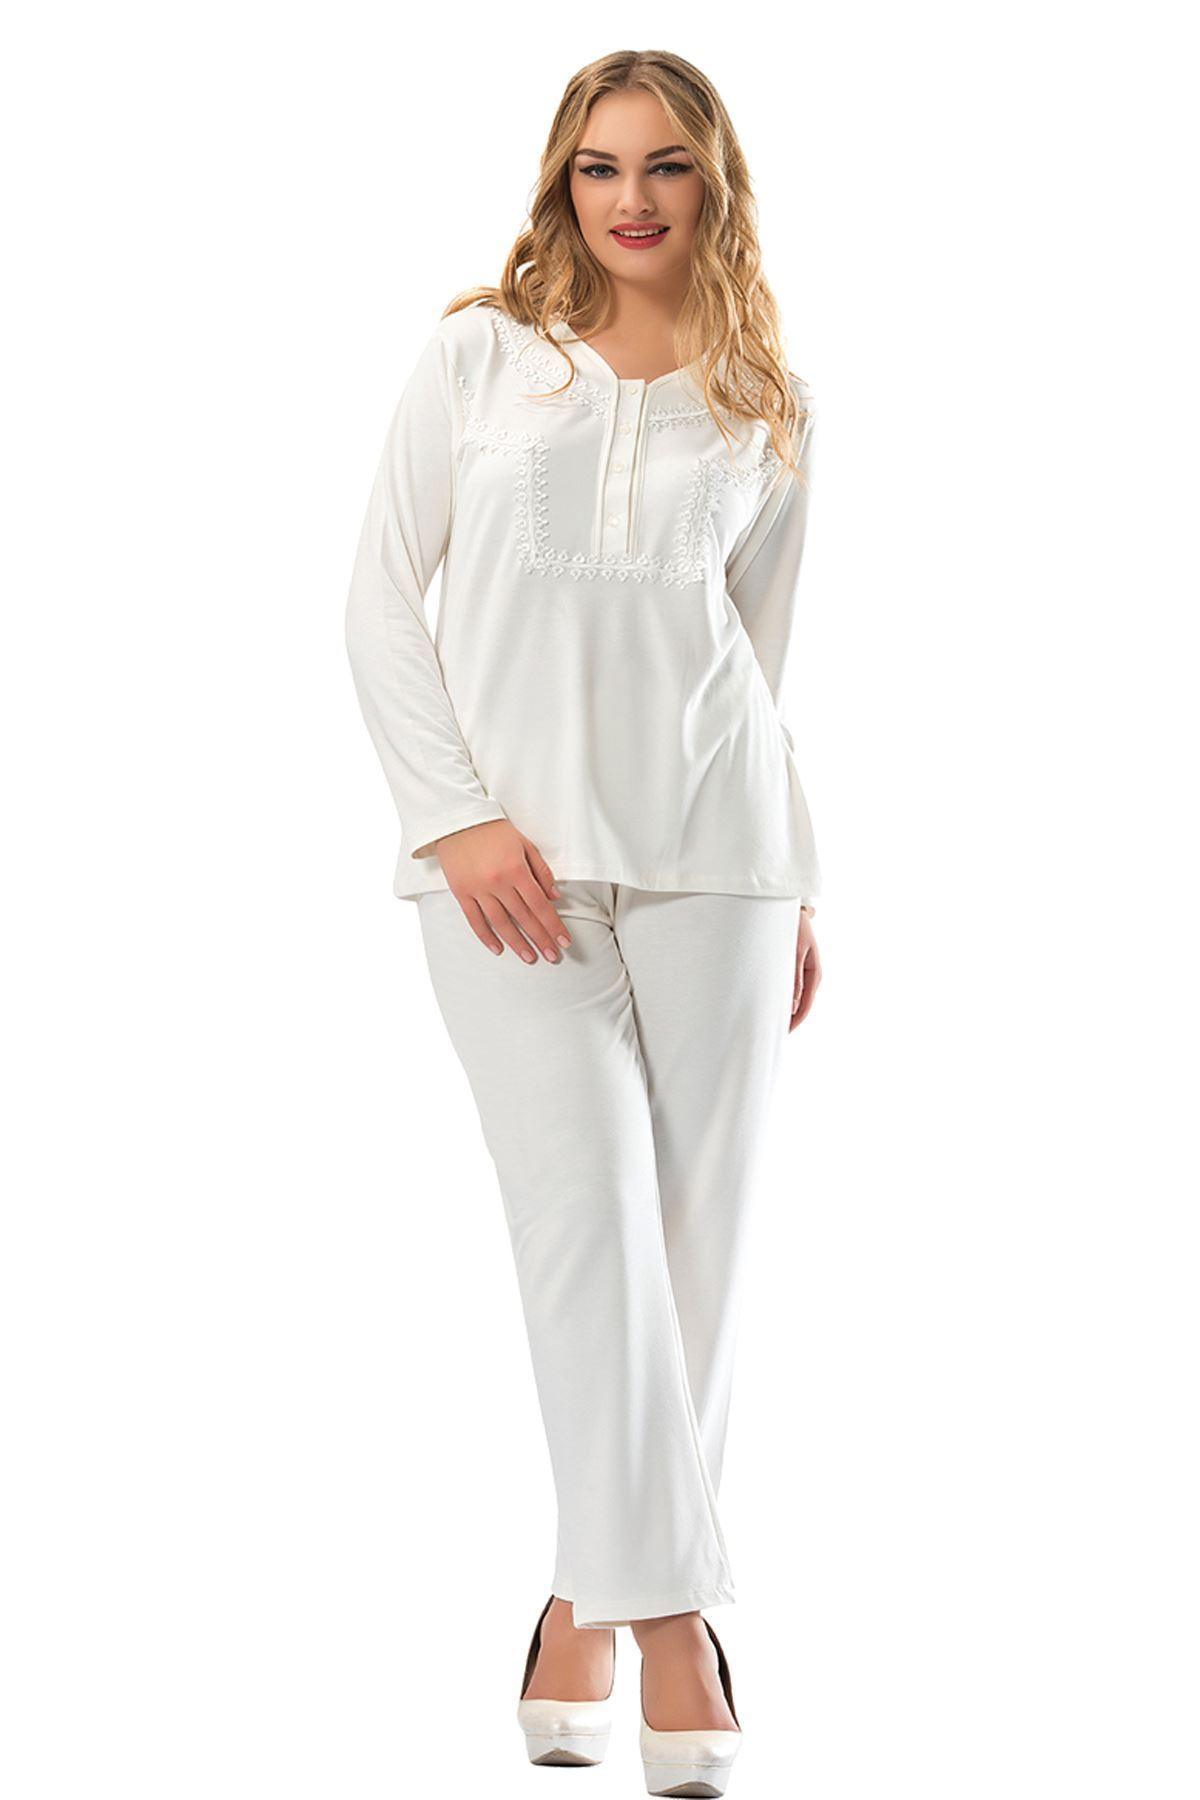 Sistina 1577 penye çeyizlik pijama takım